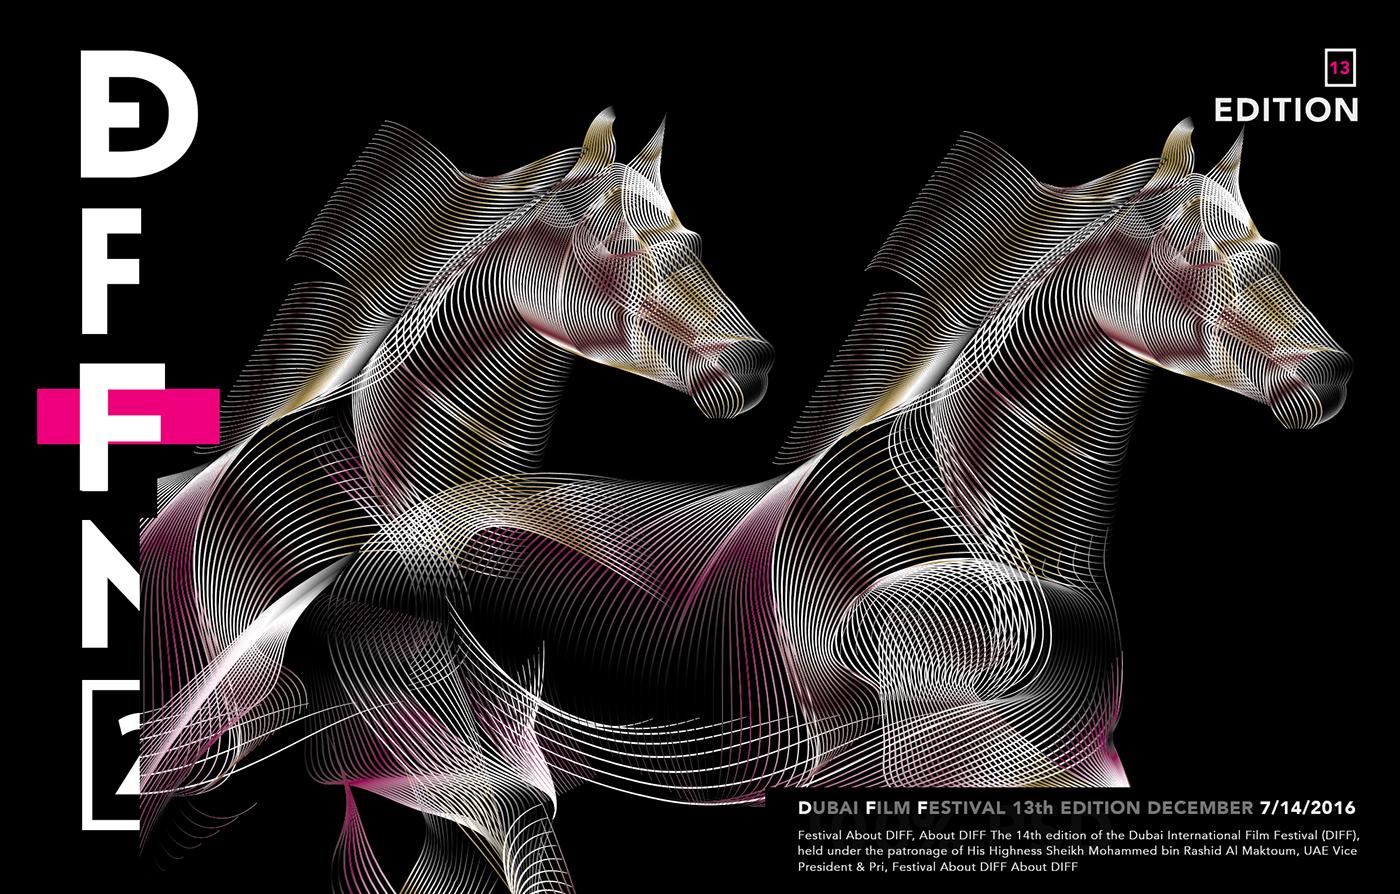 horse dubai film festival lines chronophotography branding  Movies festival tutorial free editorial